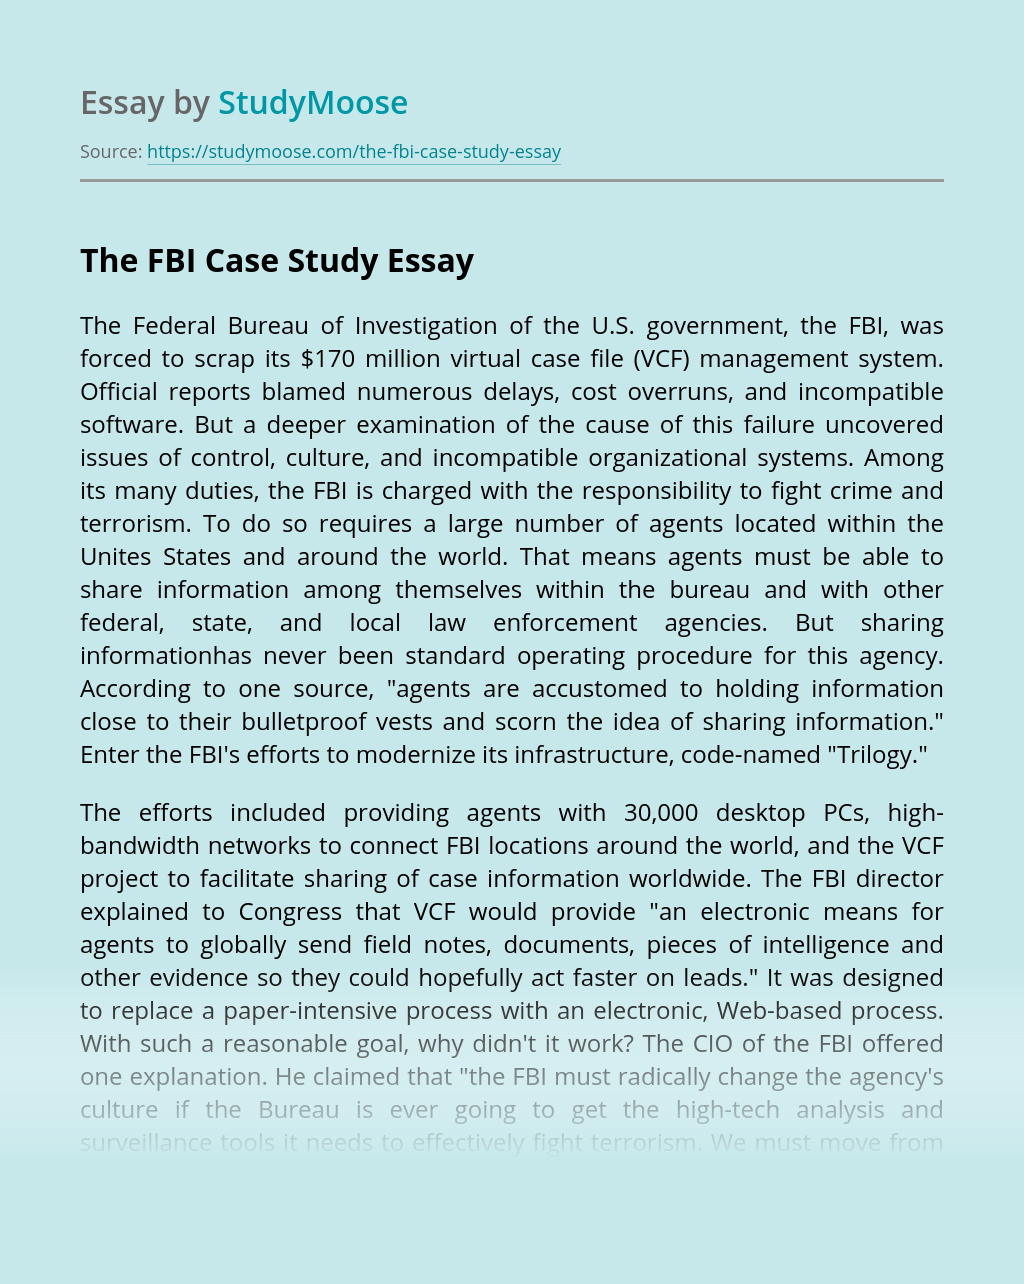 The FBI Case Study